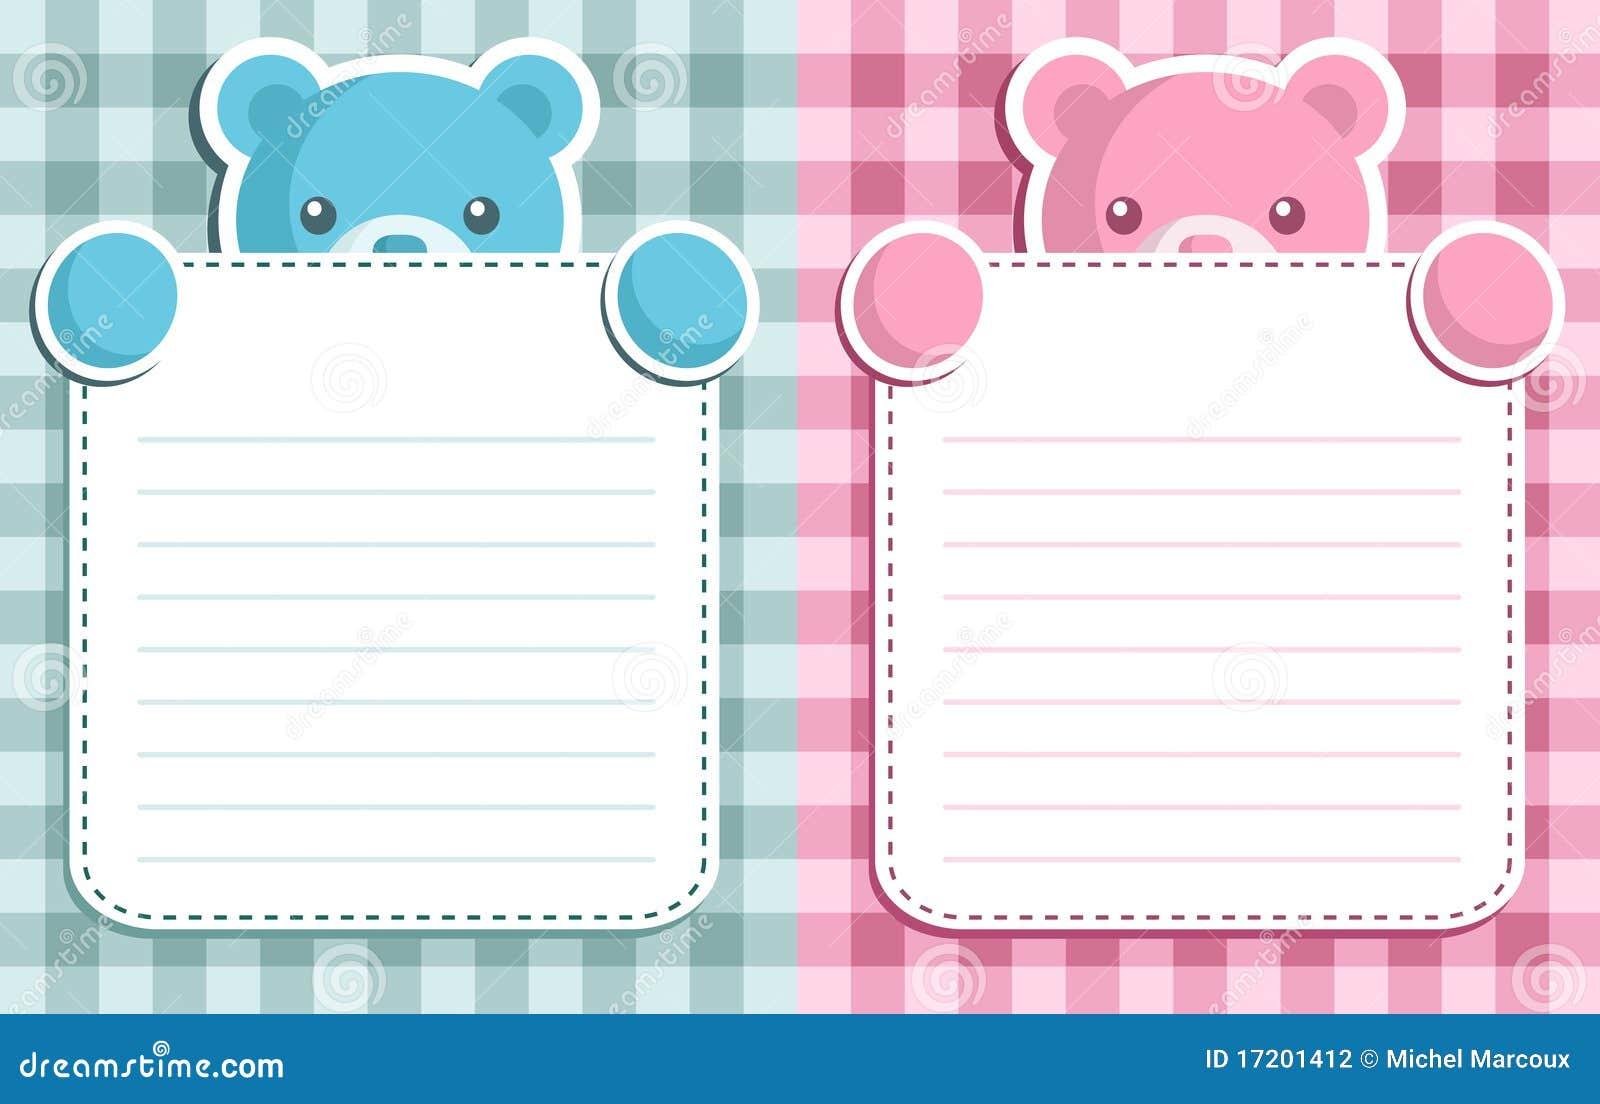 Baby Shower Invitation Stock Photography - Image: 17201412